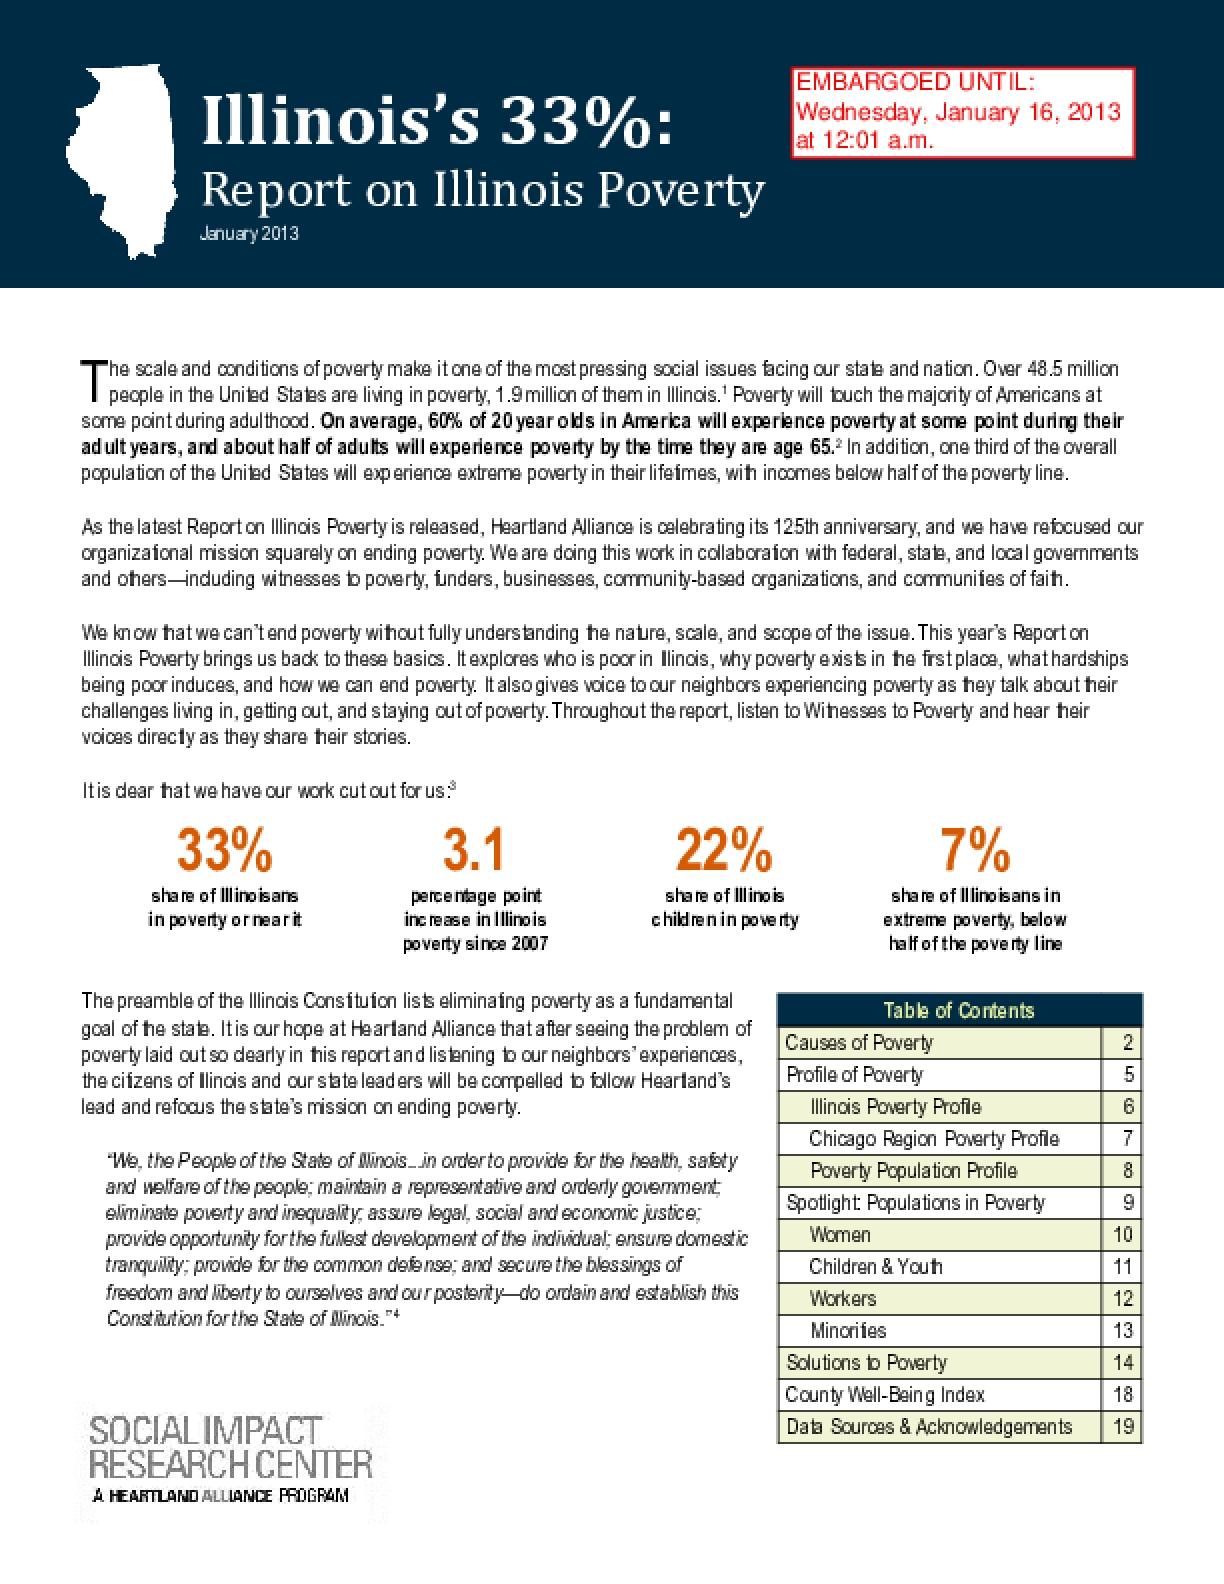 2013 Report on Illinois Poverty